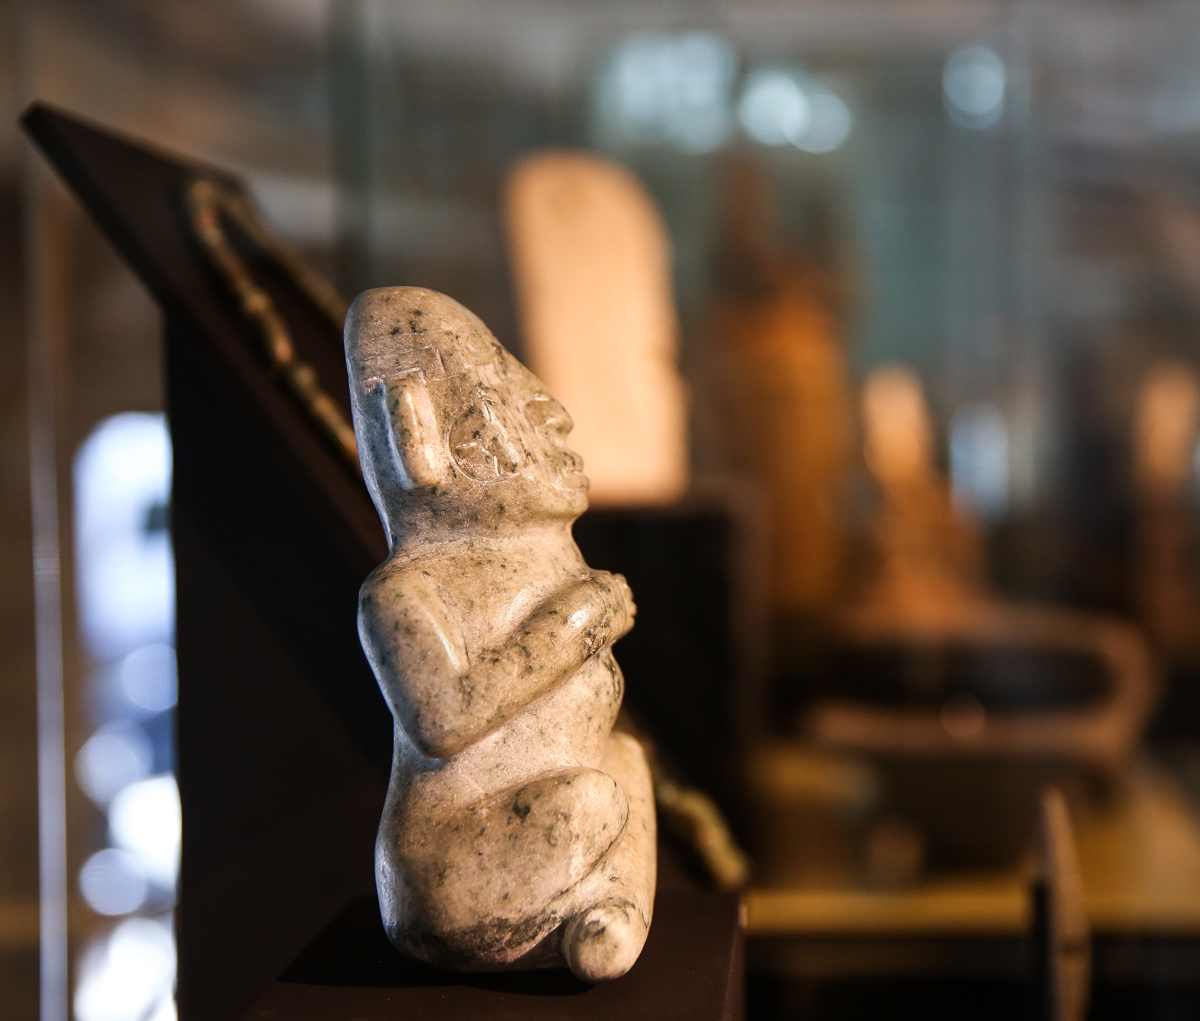 Mayan culture - Man sitting